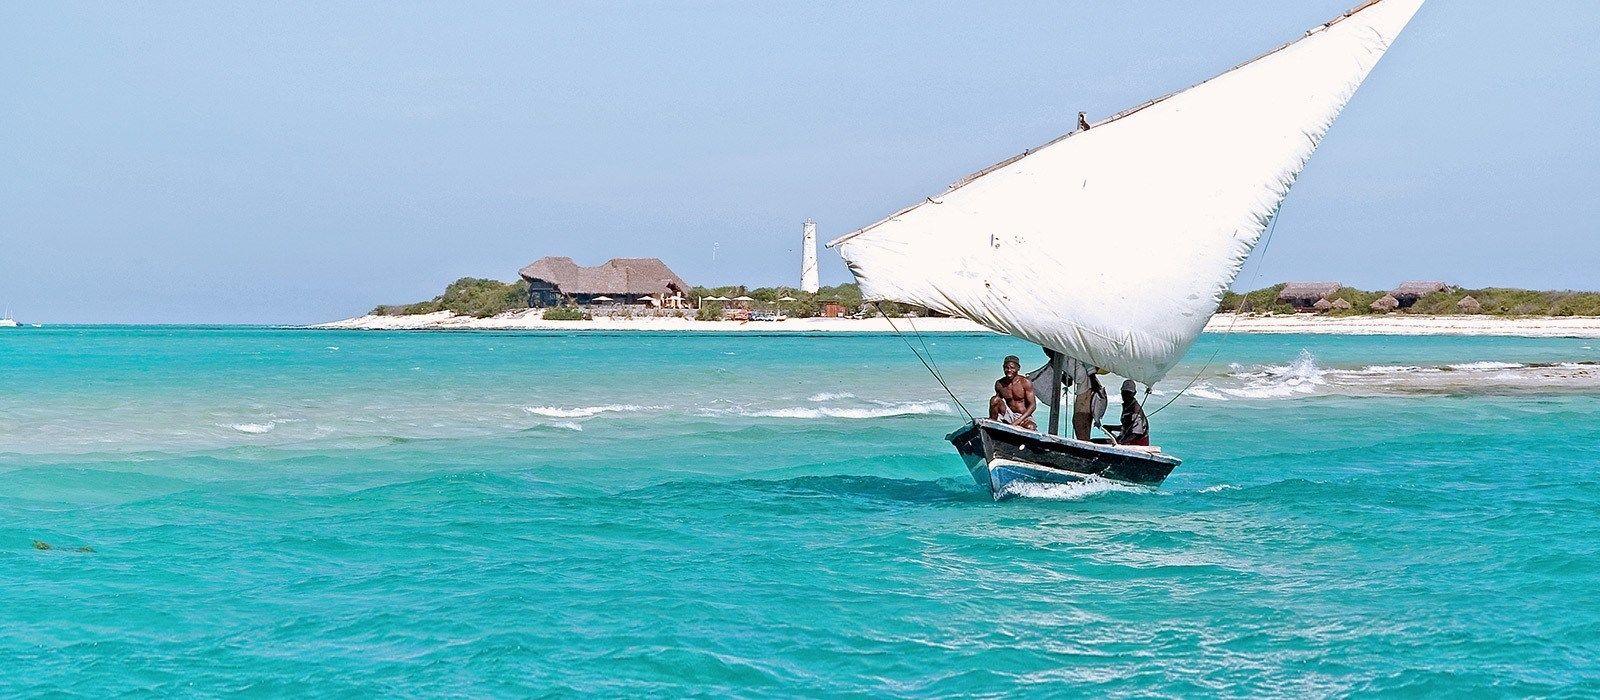 Destination Quirimbas Mozambique